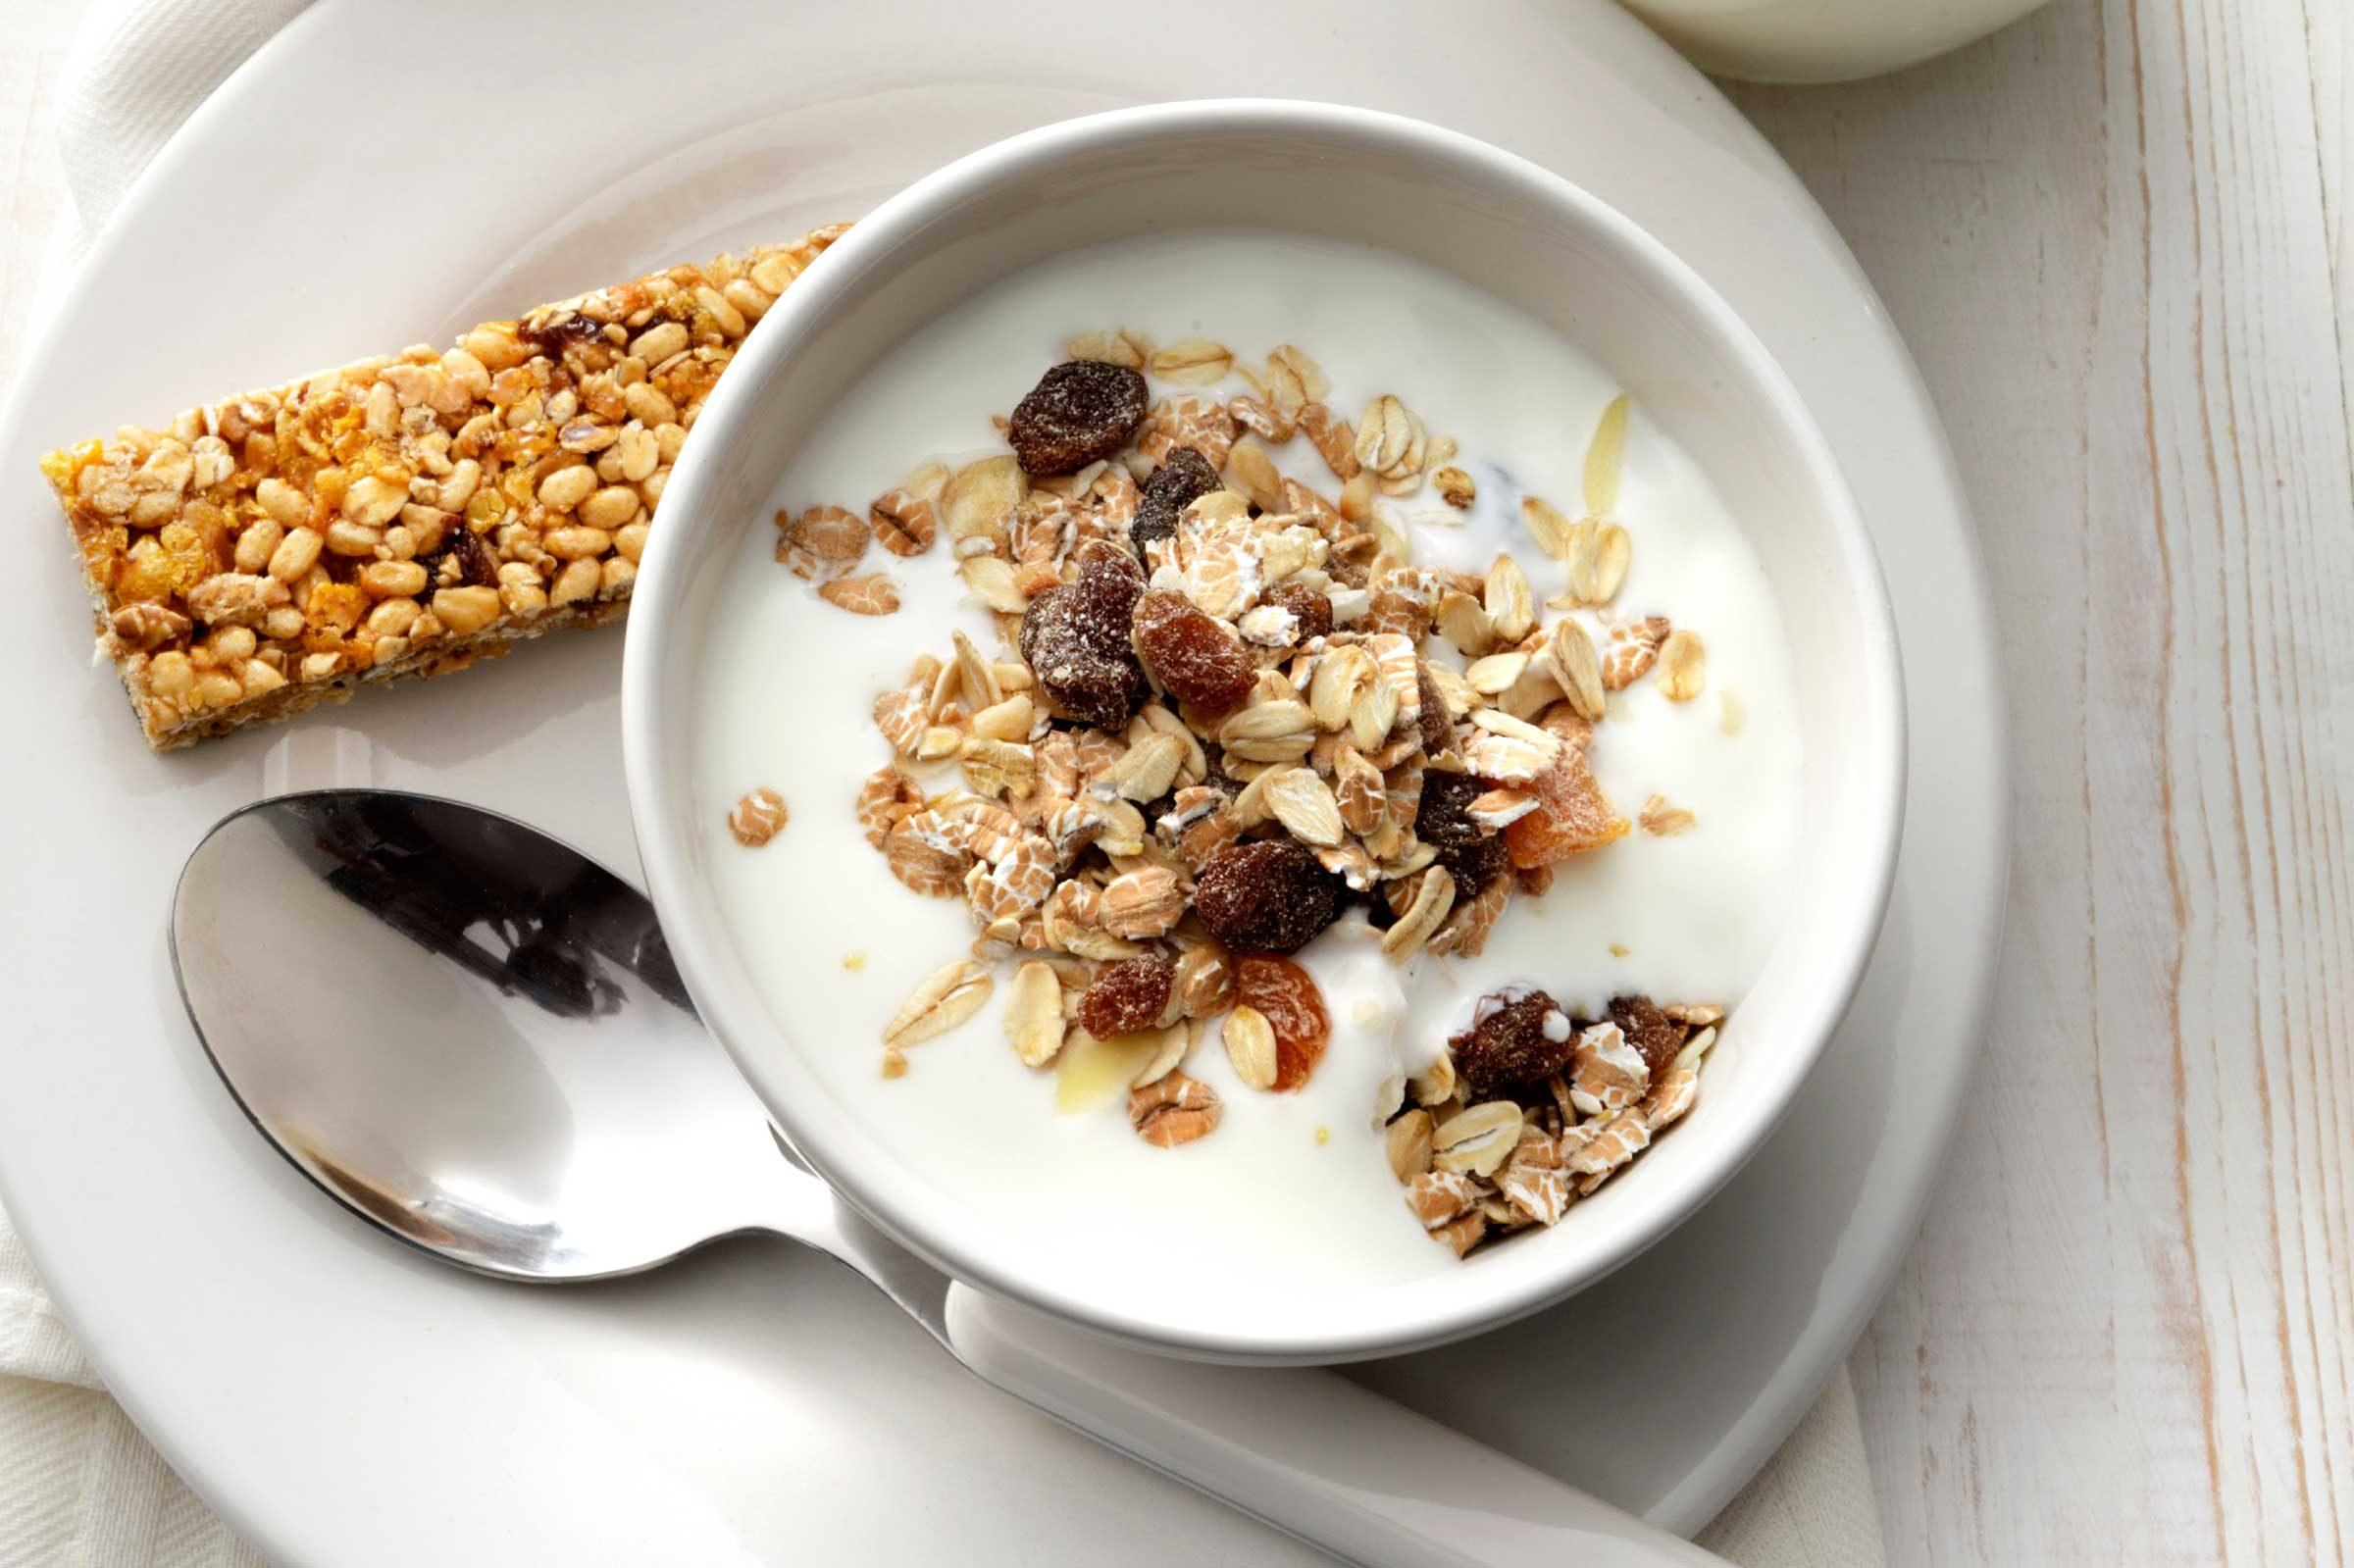 bowl of yogurt with granola